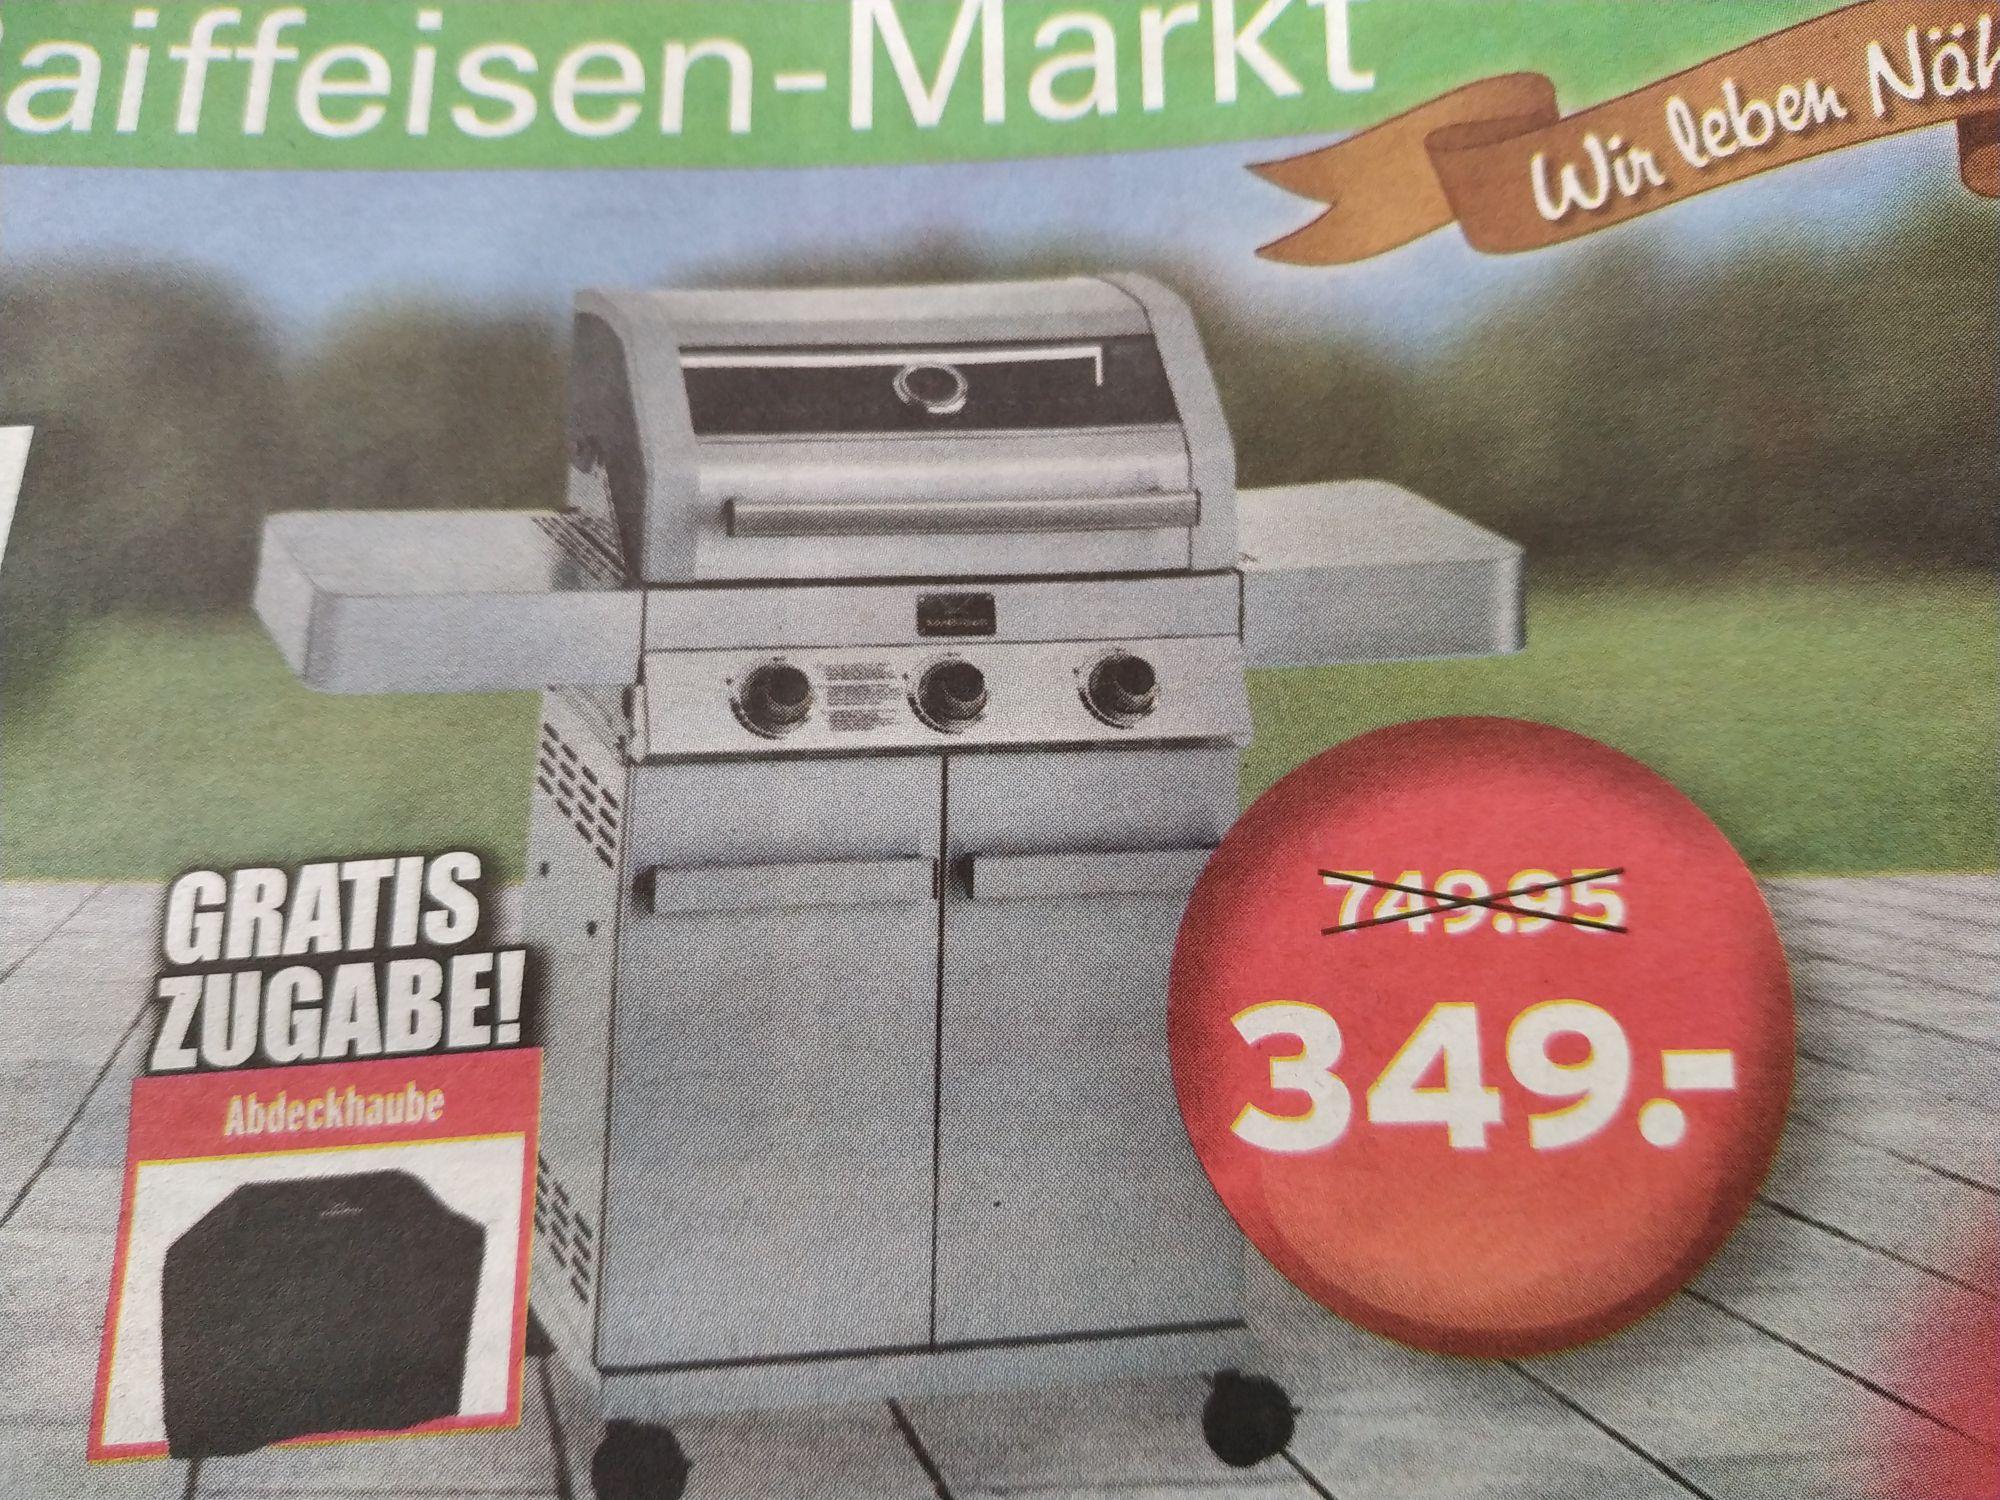 Rösle Gasgrill G3 Idealo : Rösle sansibar g3 gasgrill raiffeisen lokal? mydealz.de